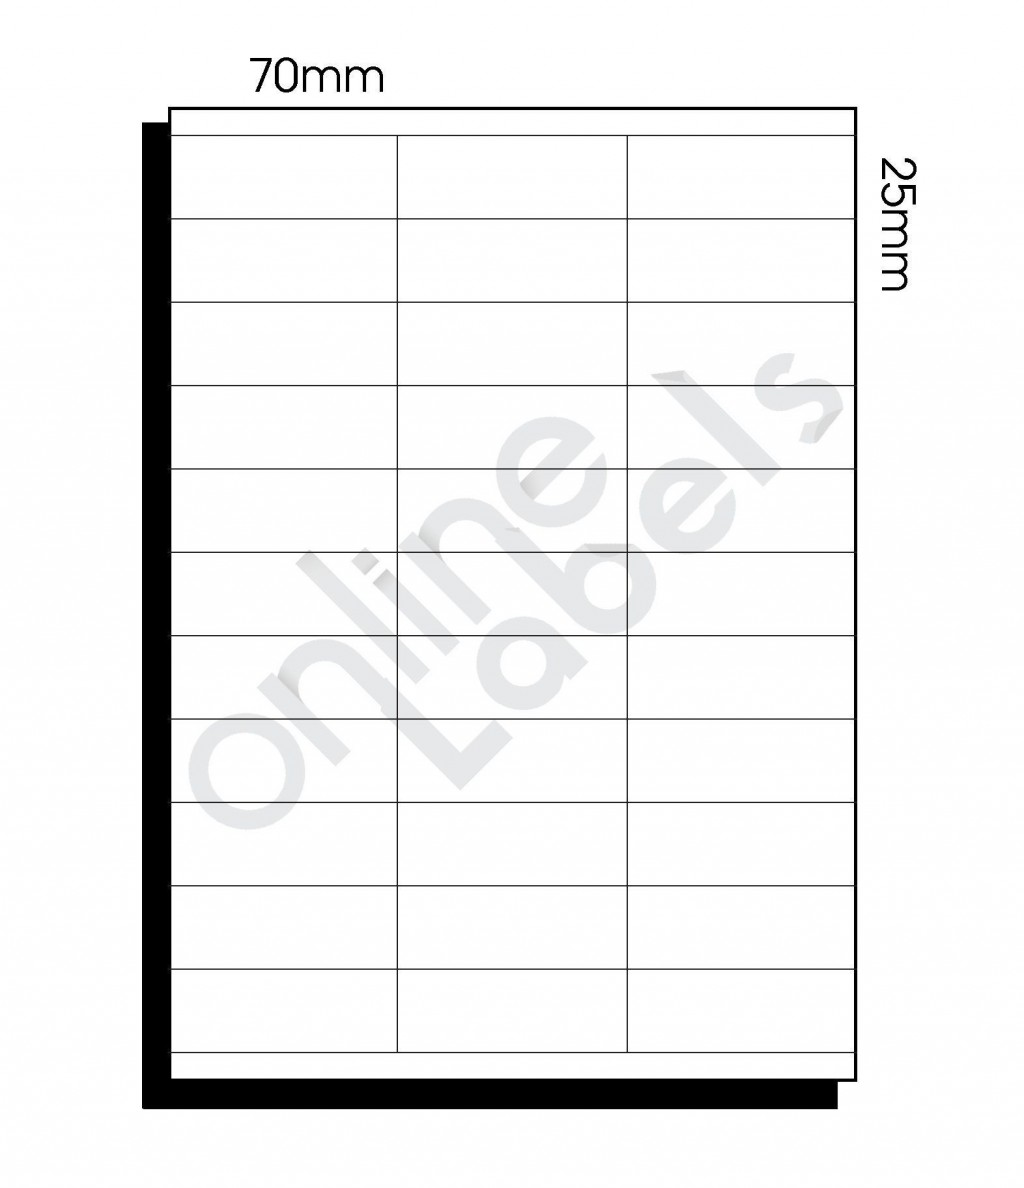 004 Stupendou Microsoft Word Label Template Free Image  Dvd Download Water BottleLarge